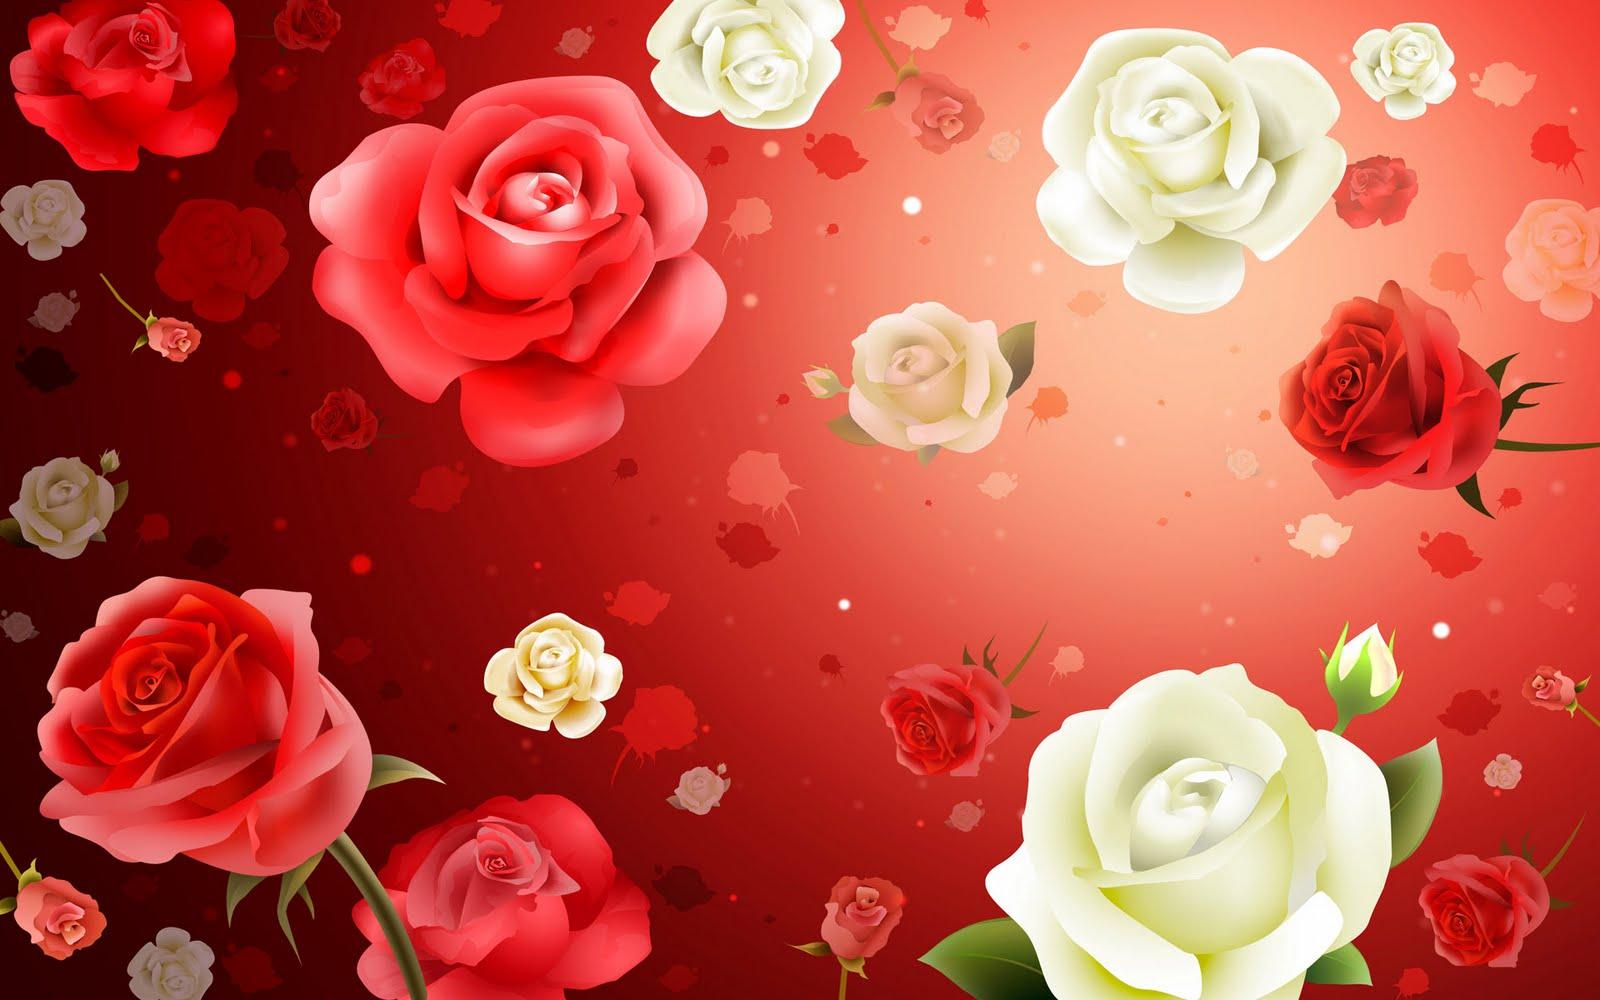 Flower Wallpaper Hd For Laptop Donna145